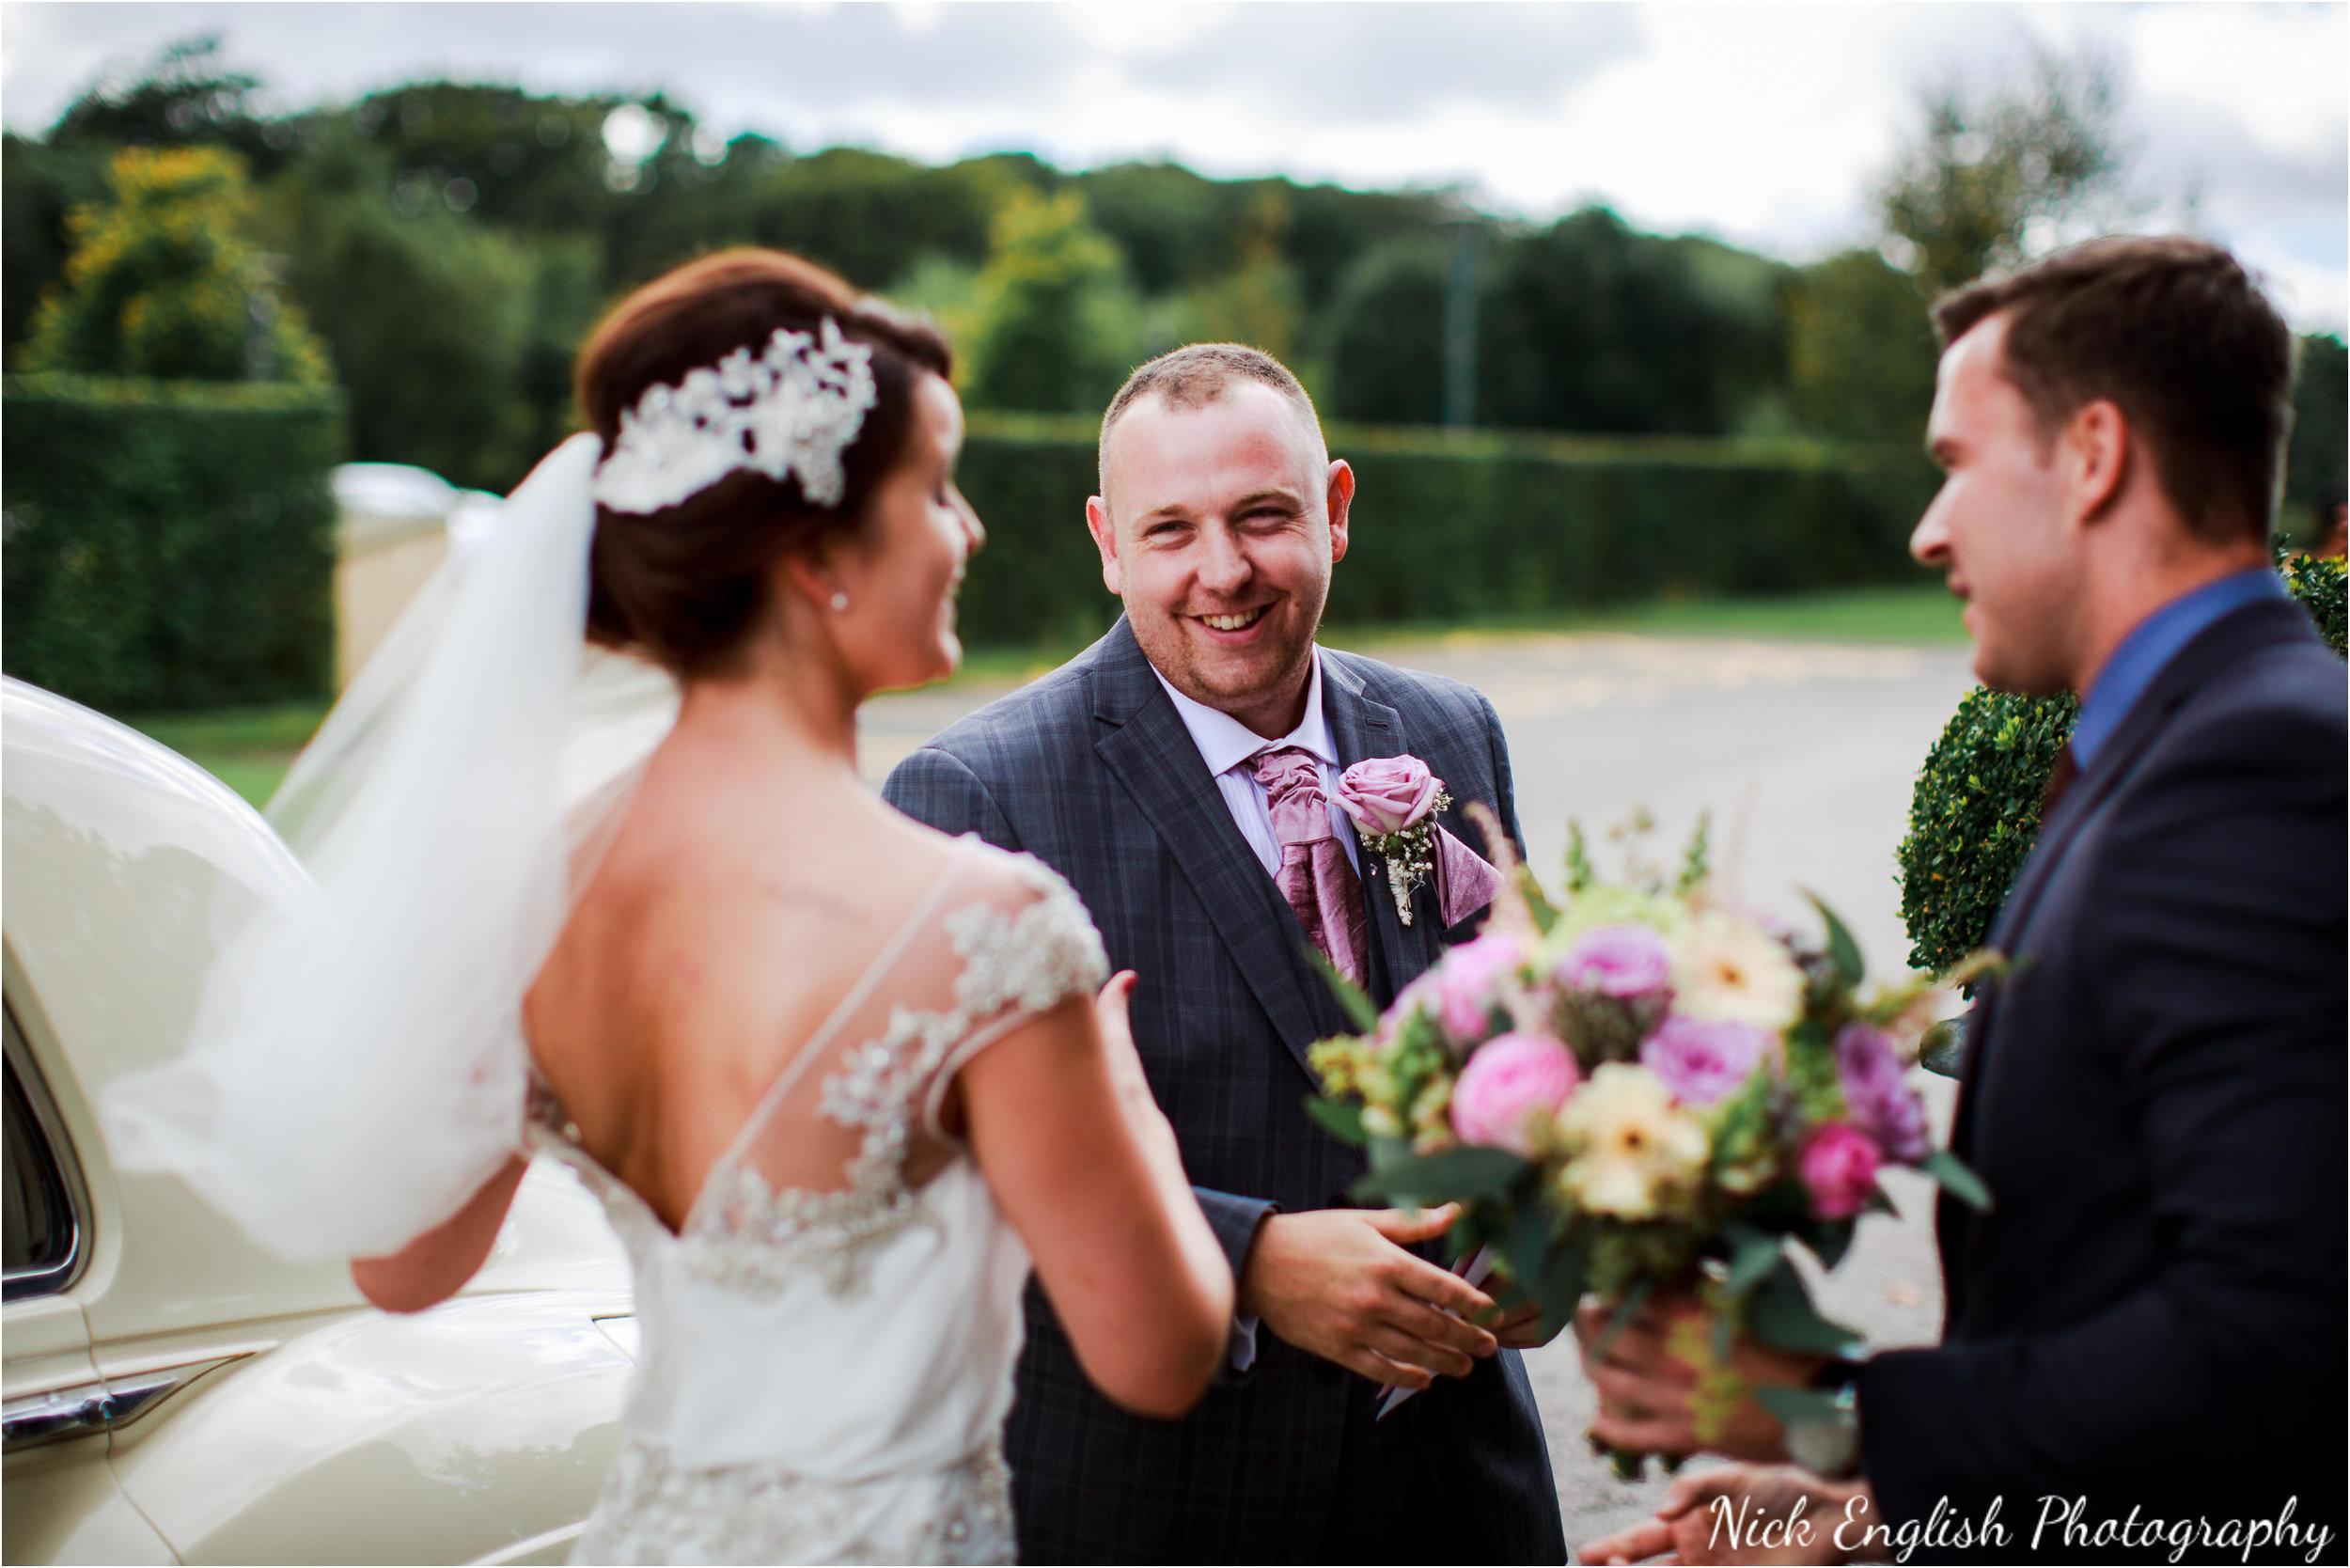 Stacey-Ash-Wedding-Photographs-Stanley-House-Preston-Lancashire-103.jpg